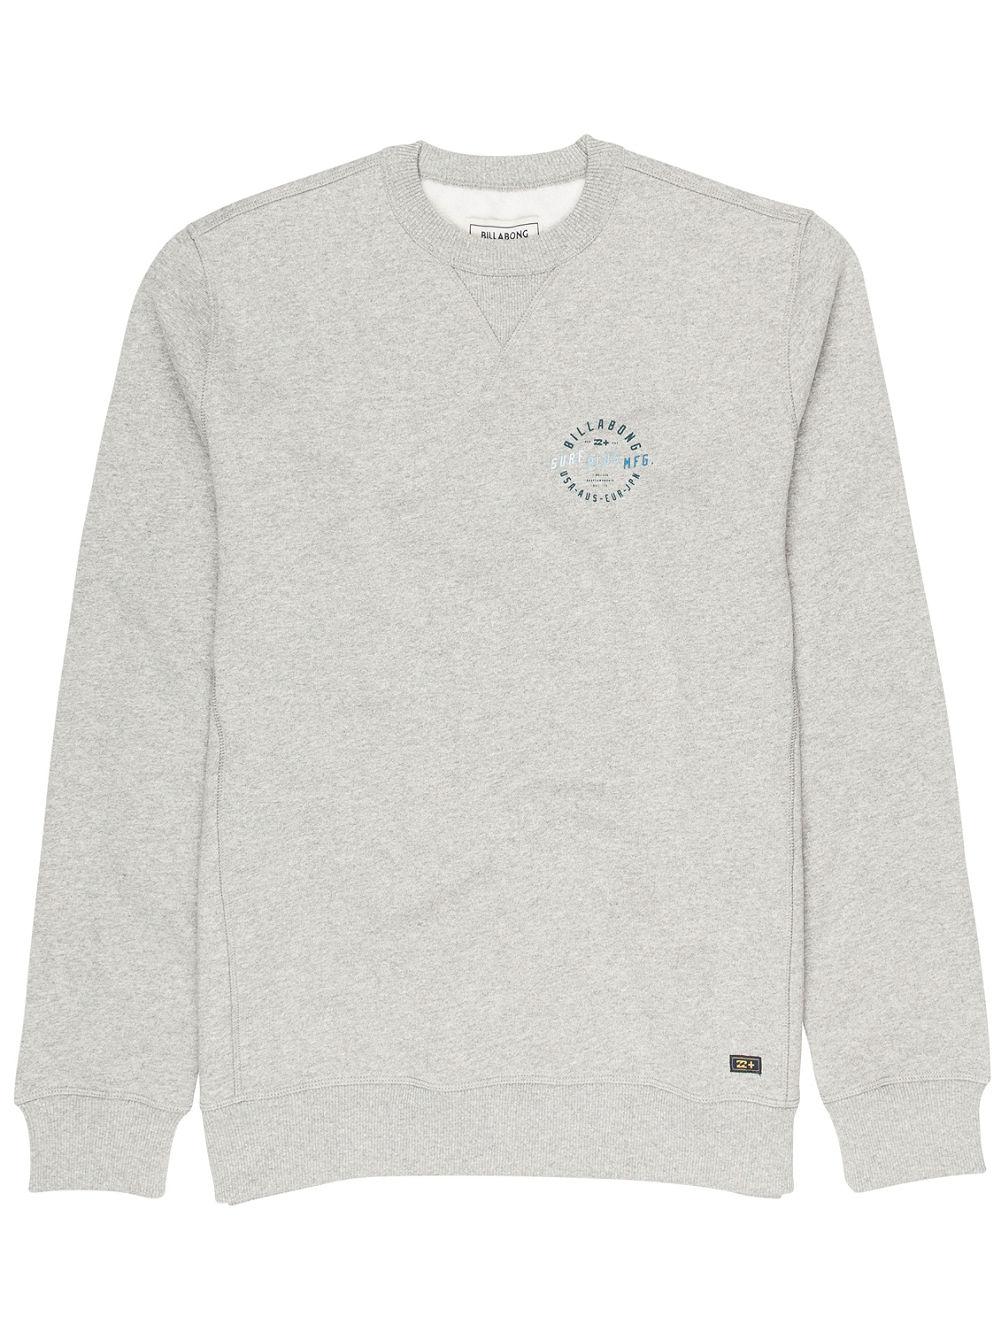 Buy Billabong Bias Crew Sweater Online At Blue Tomato